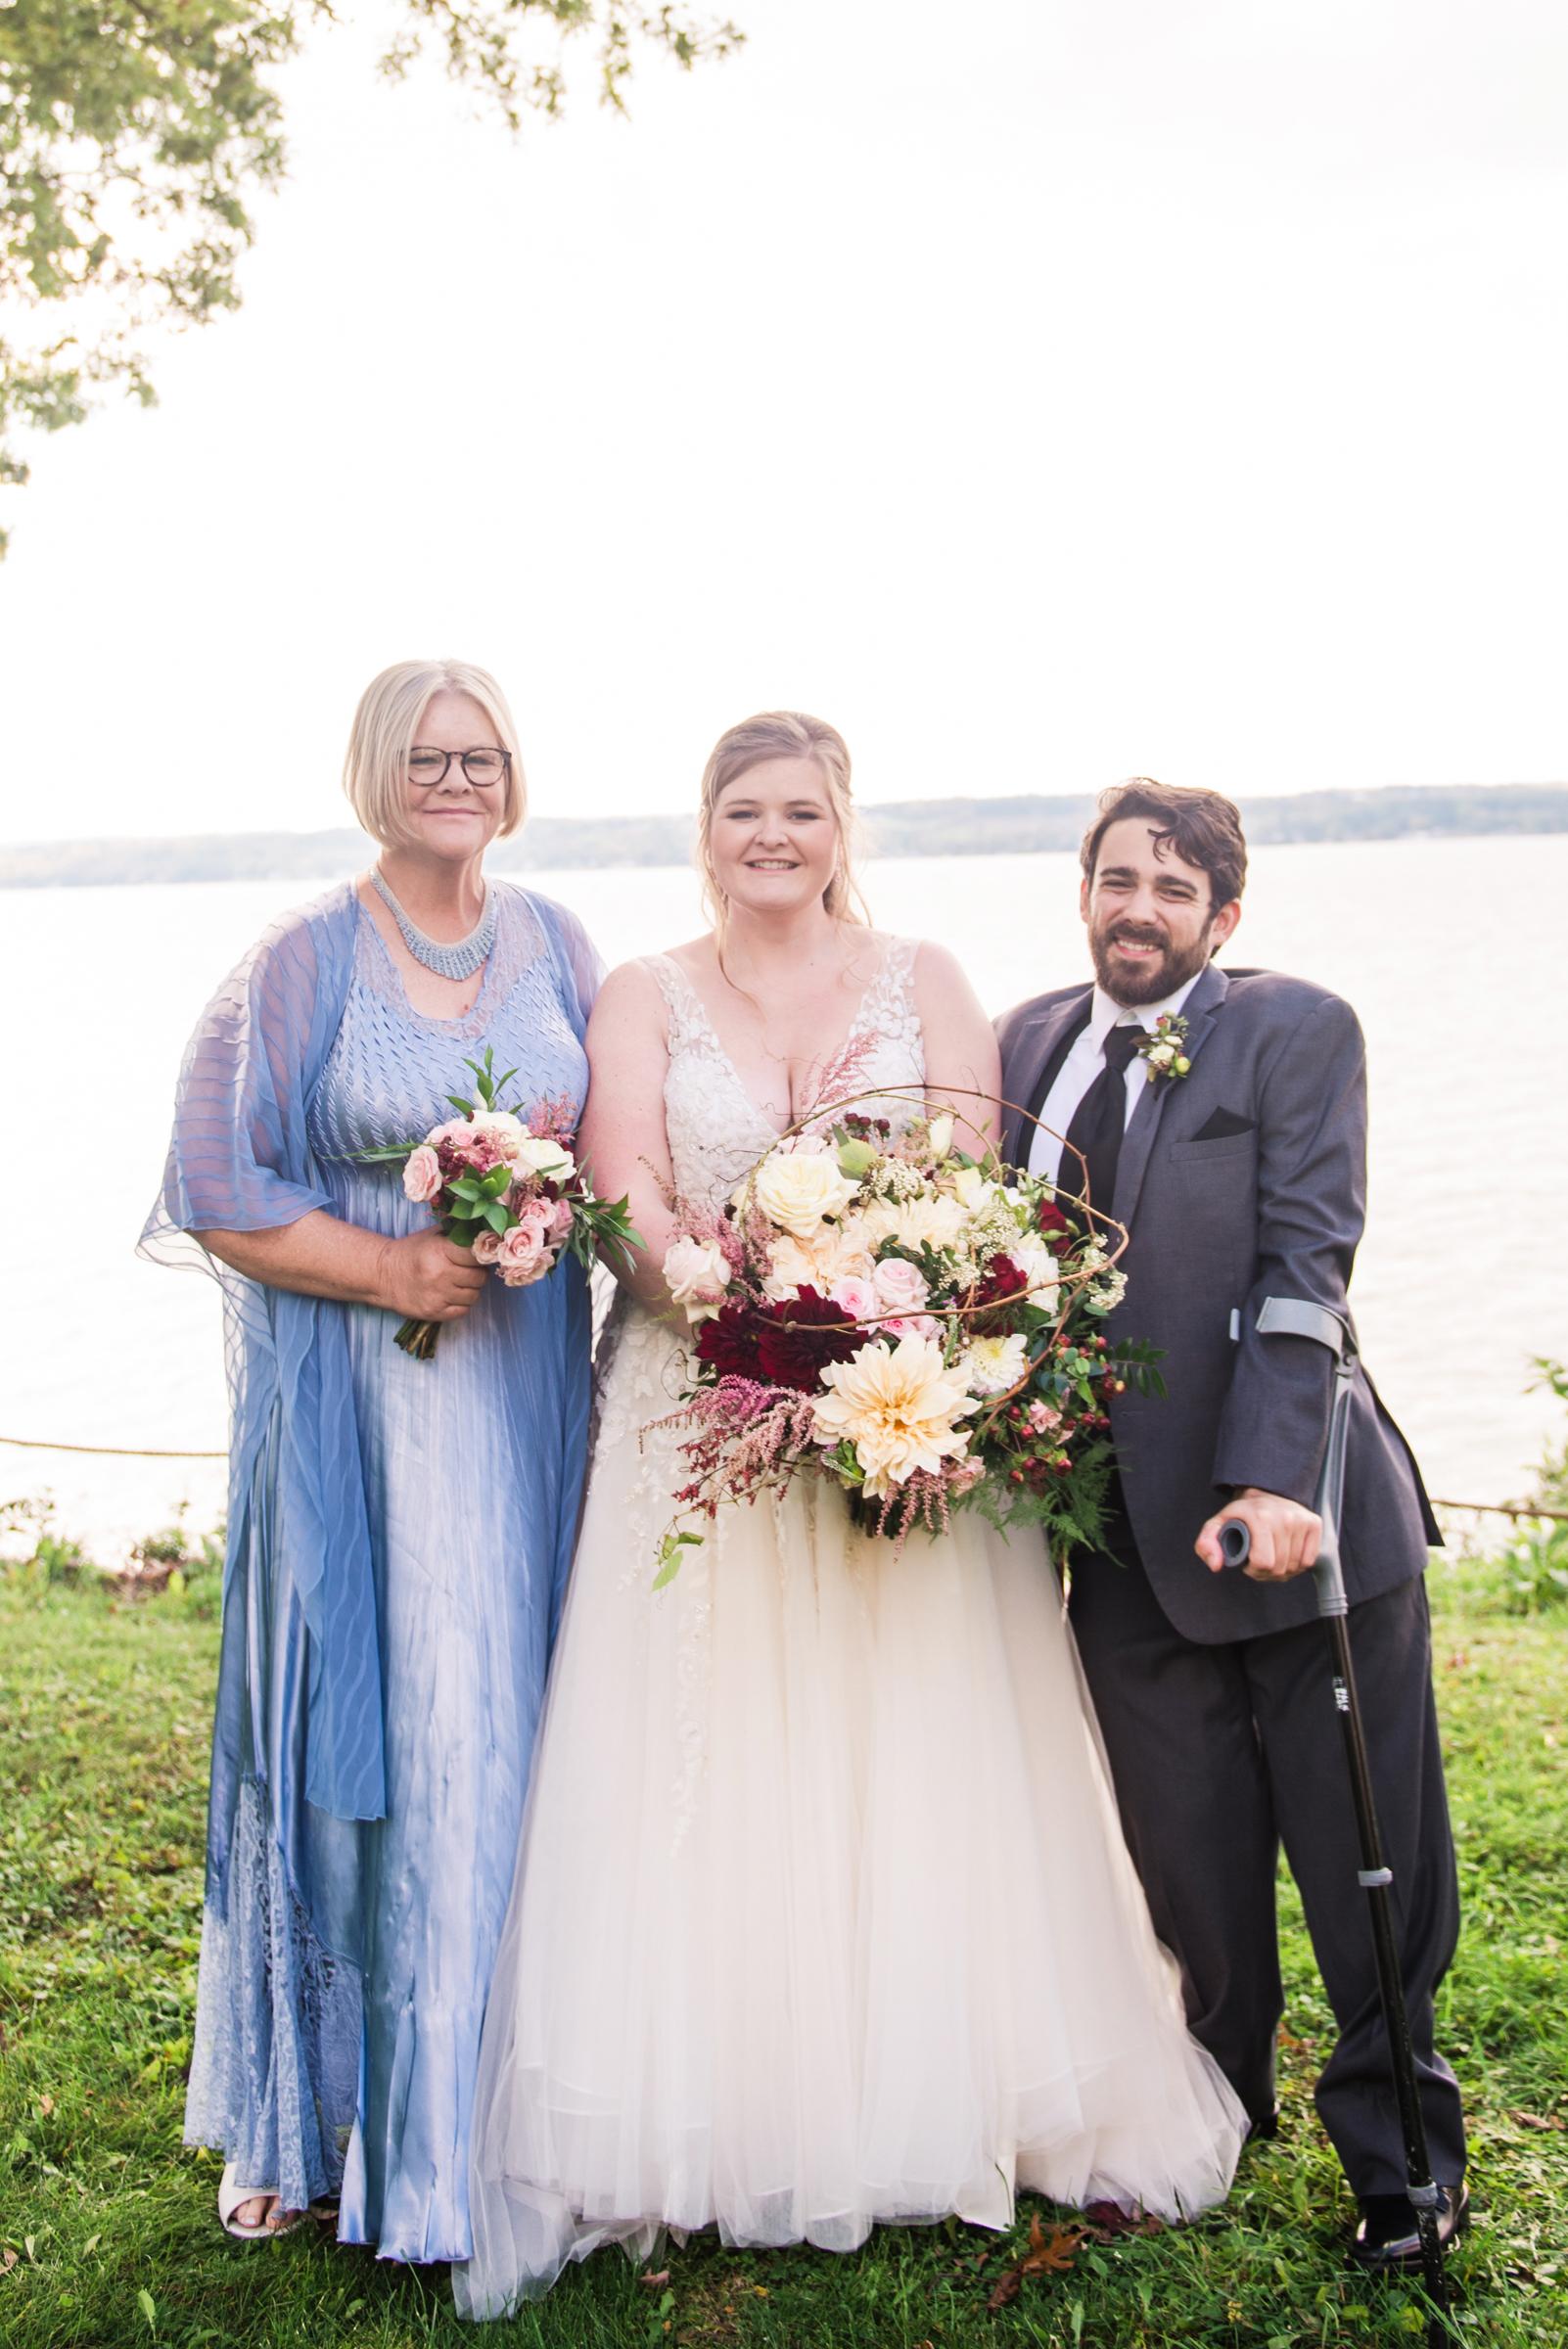 Zugibe_Vineyards_Finger_Lakes_Wedding_JILL_STUDIO_Rochester_NY_Photographer_DSC_3667.jpg